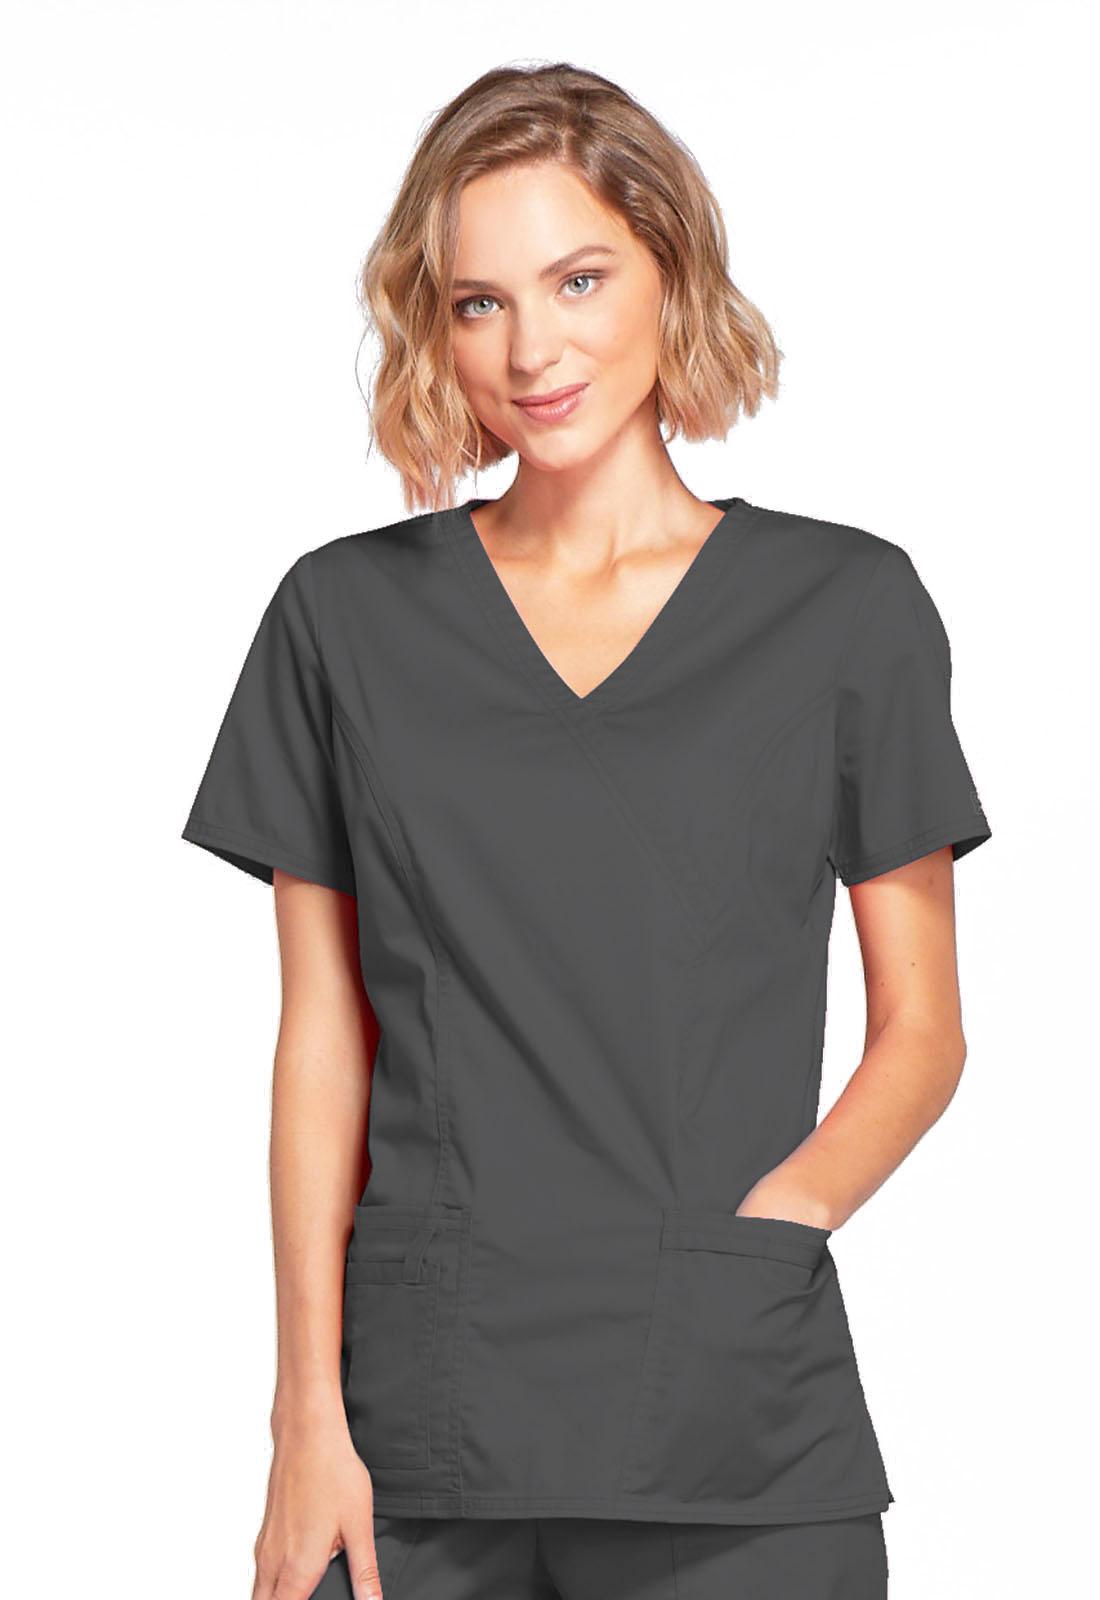 a95ef87093f WW Core Stretch Mock Wrap Top 4728-PWTW from Cedar Park Medical Uniforms